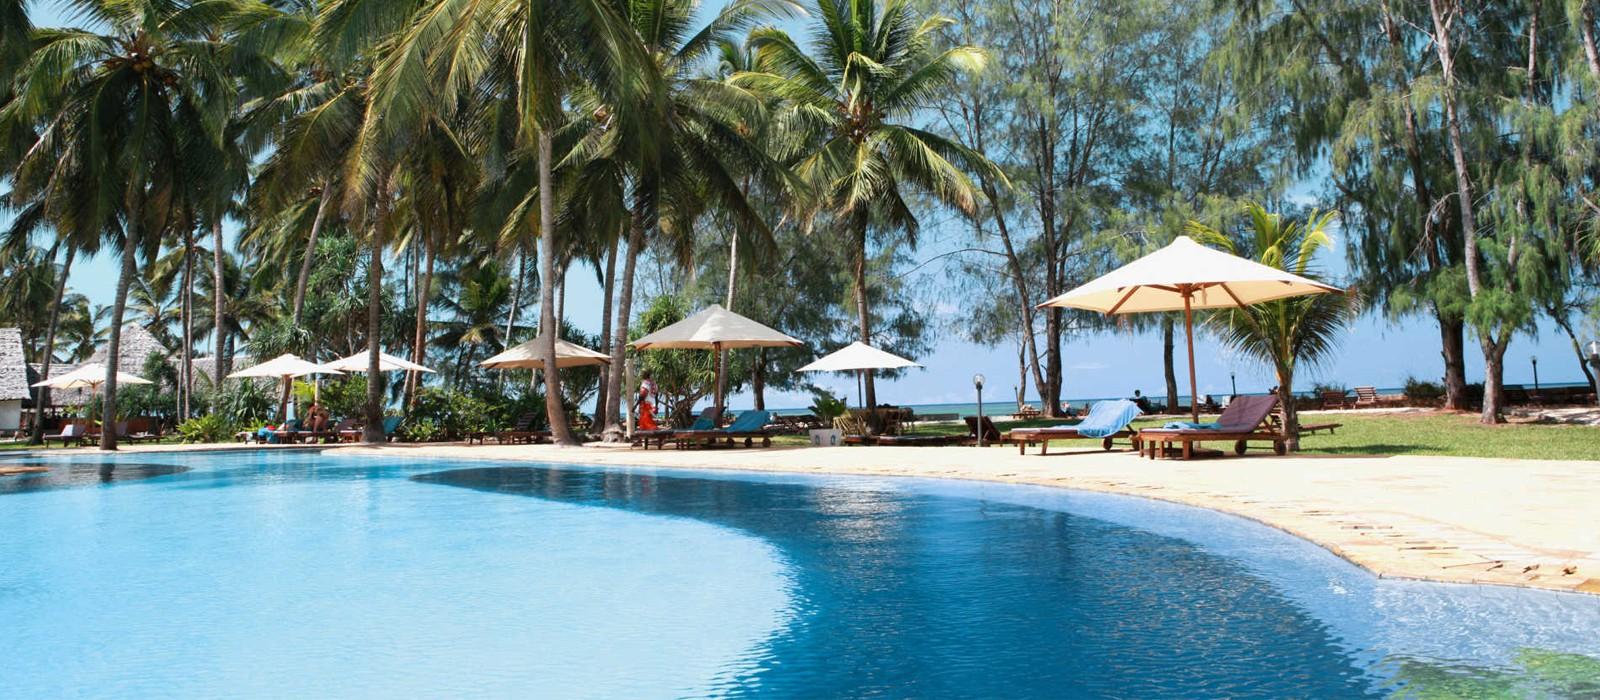 Luxury Zanzibar Holiday Packages Bluebay Beach Resort And Spa Header